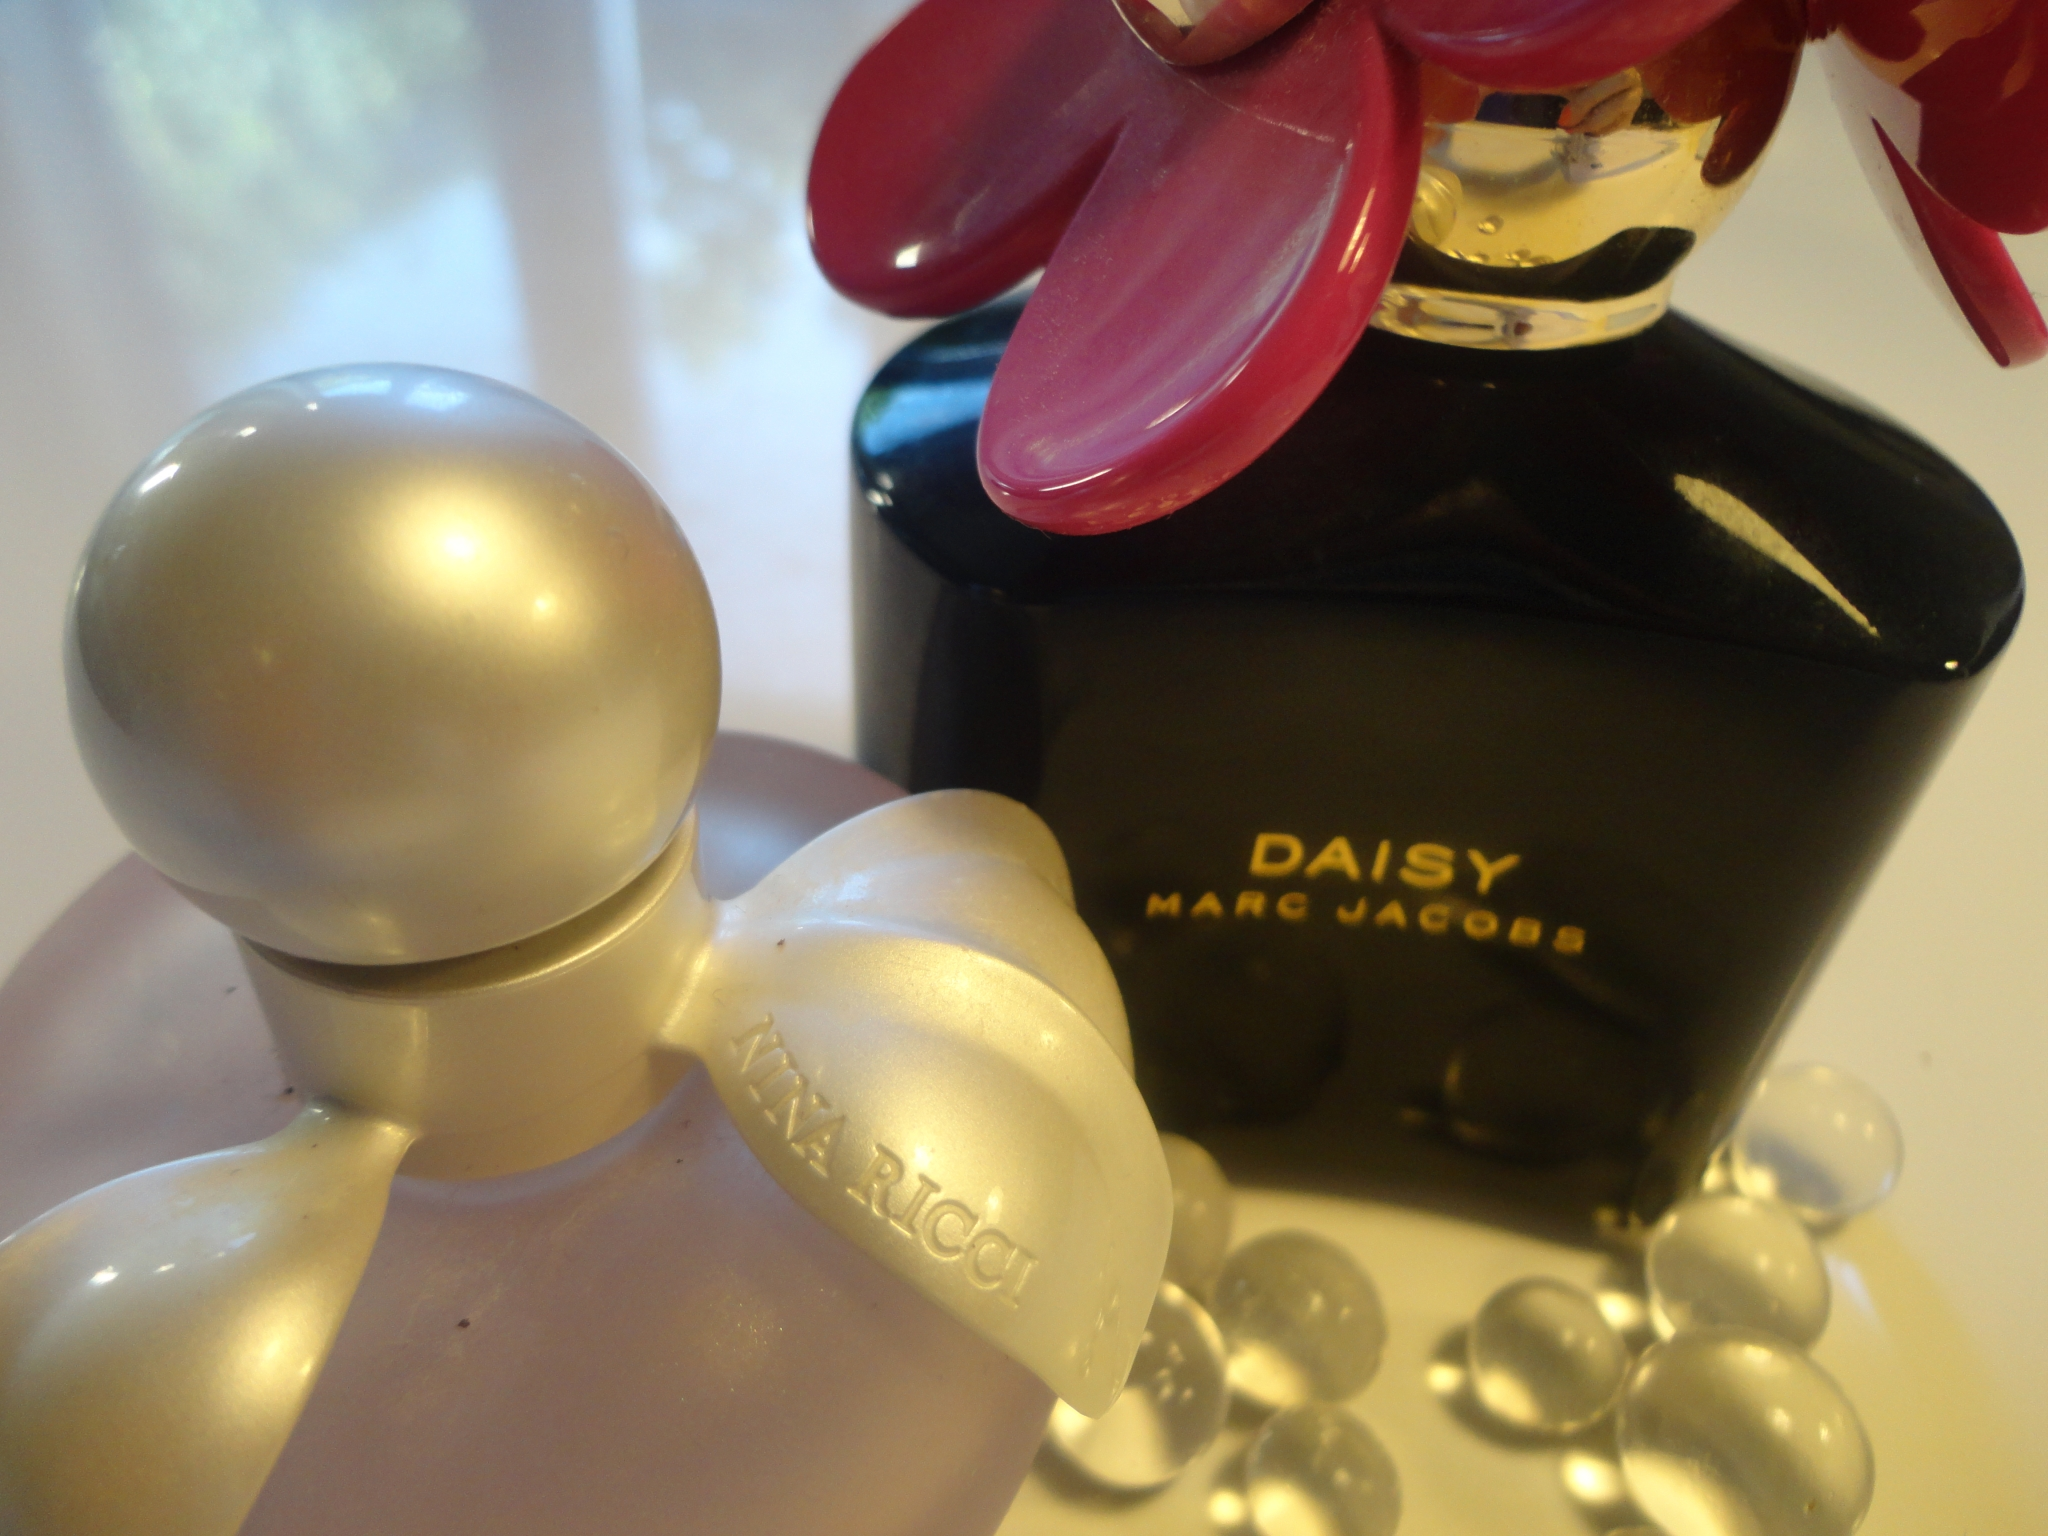 Mijn favoriete parfum